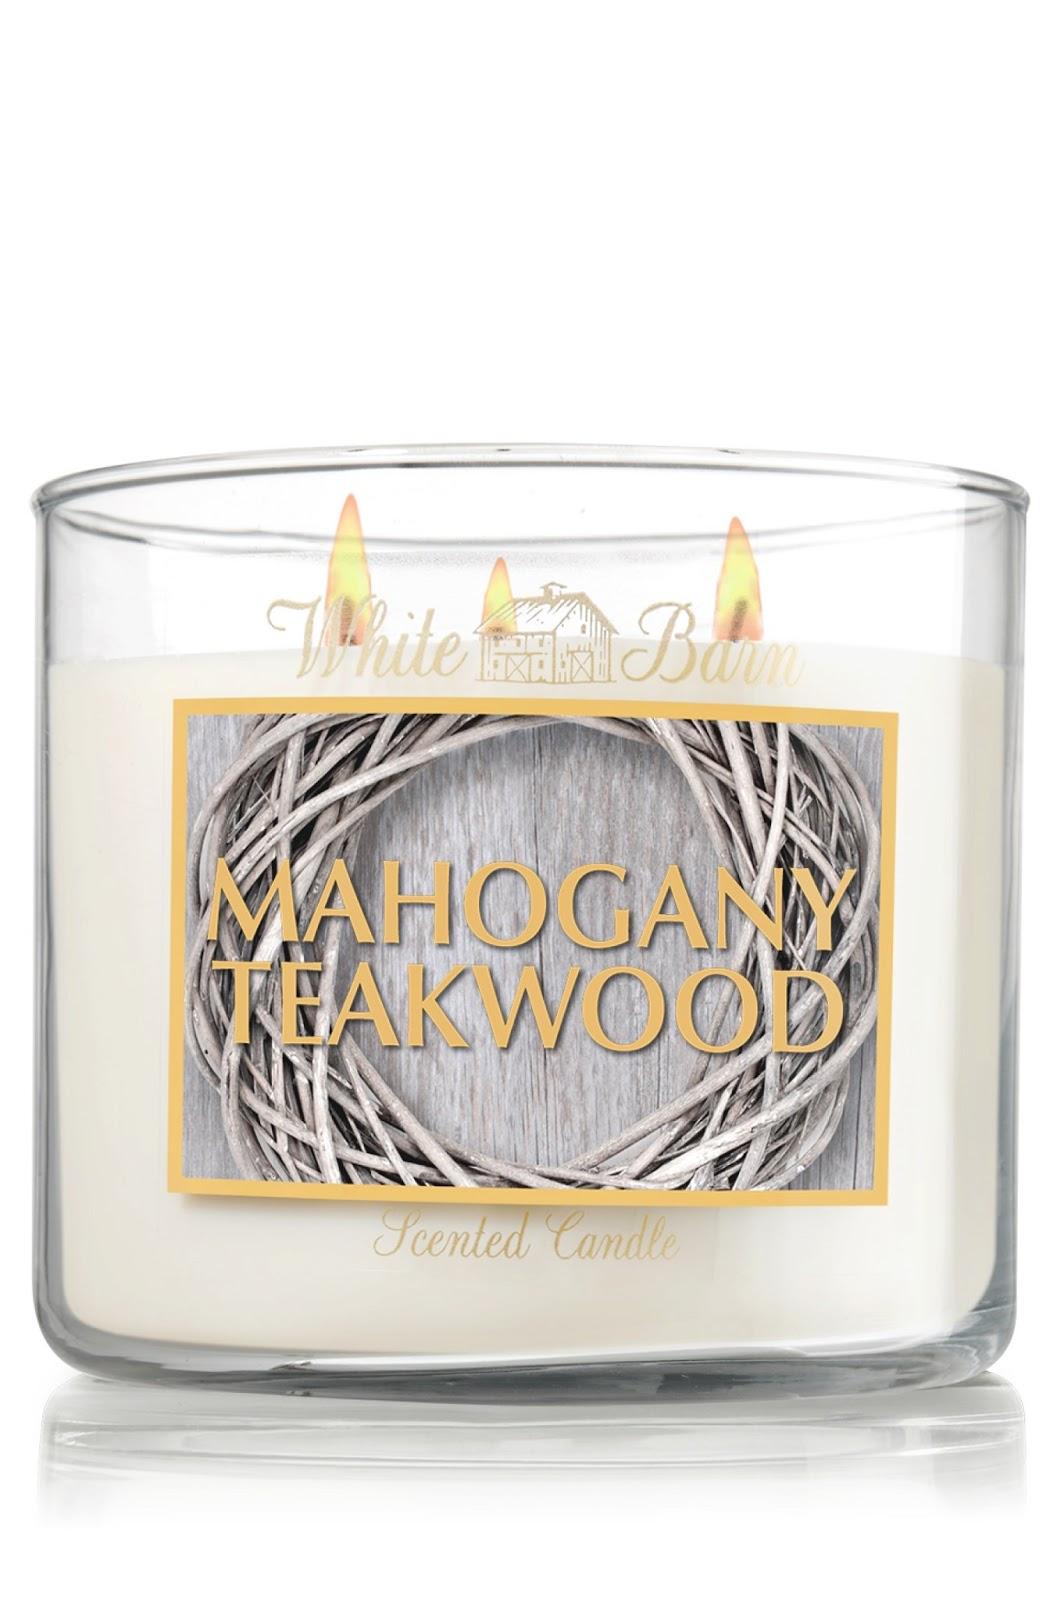 Hot Mess Award Mahogany Teakwood